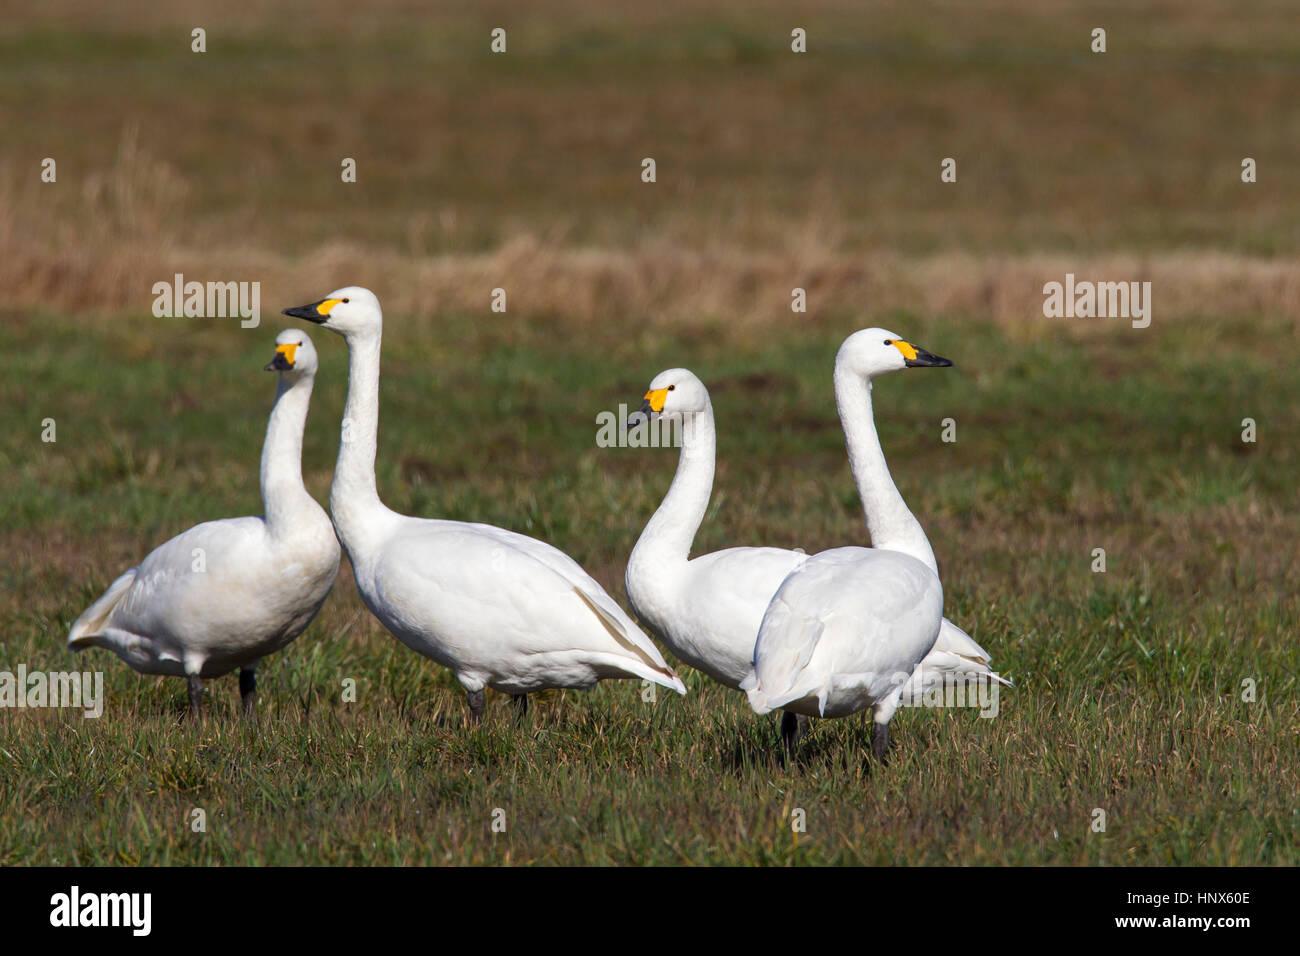 Tundra swans (Cygnus columbianus) / Bewick's swans (Cygnus bewickii) flock foraging in meadow in spring - Stock Image